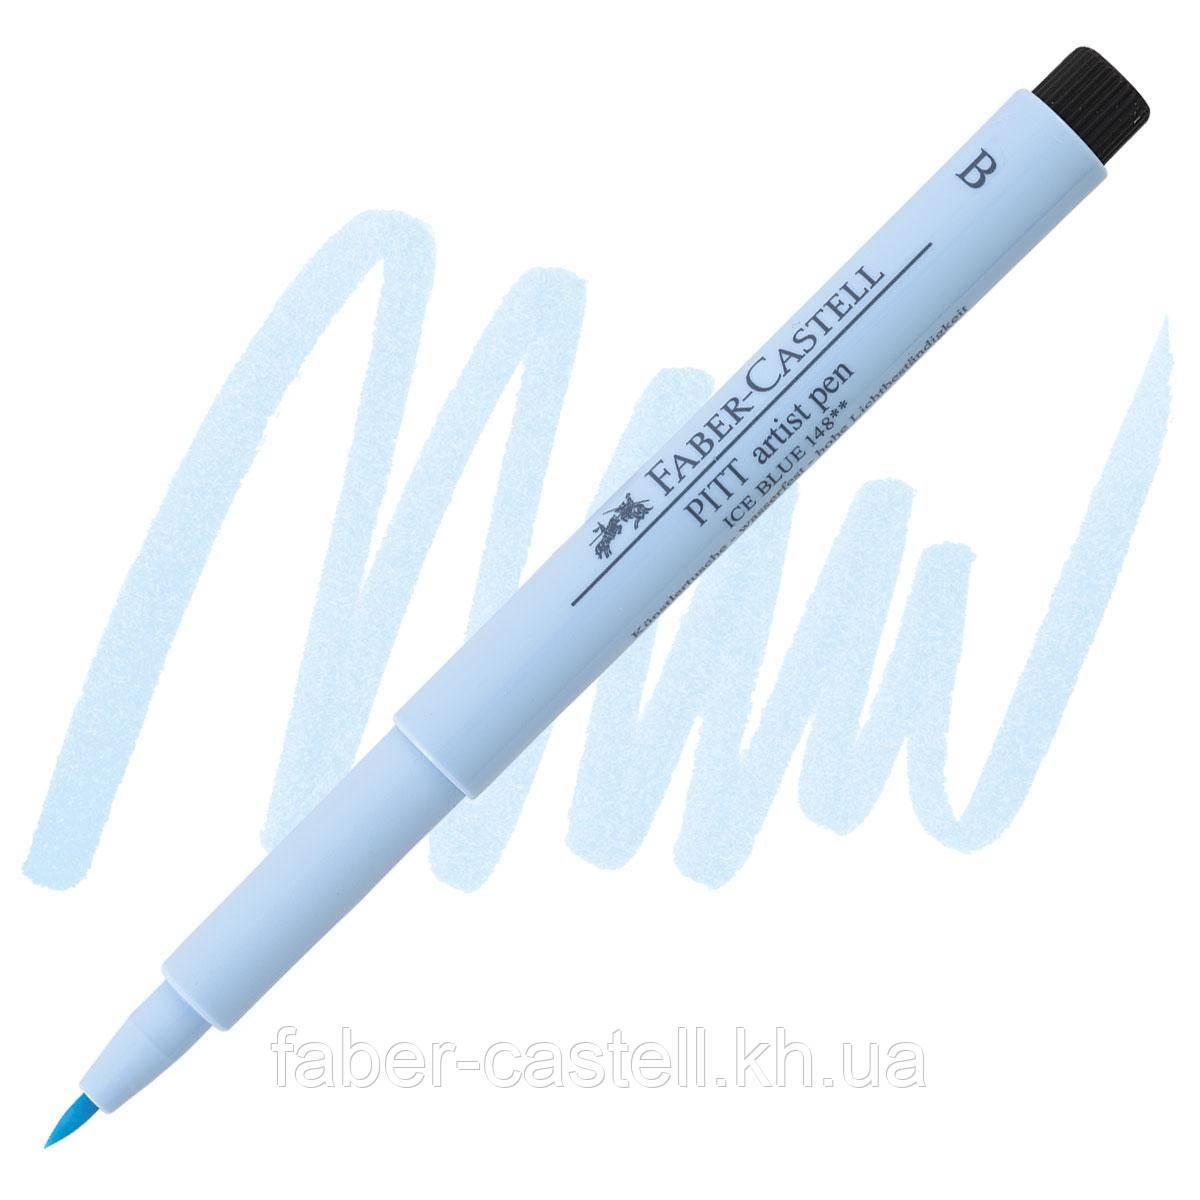 "Ручка-кисточка капиллярная Faber - Castell PITT® ARTIST PEN ""BRUSH"" №148 ледово-синий, 167448"